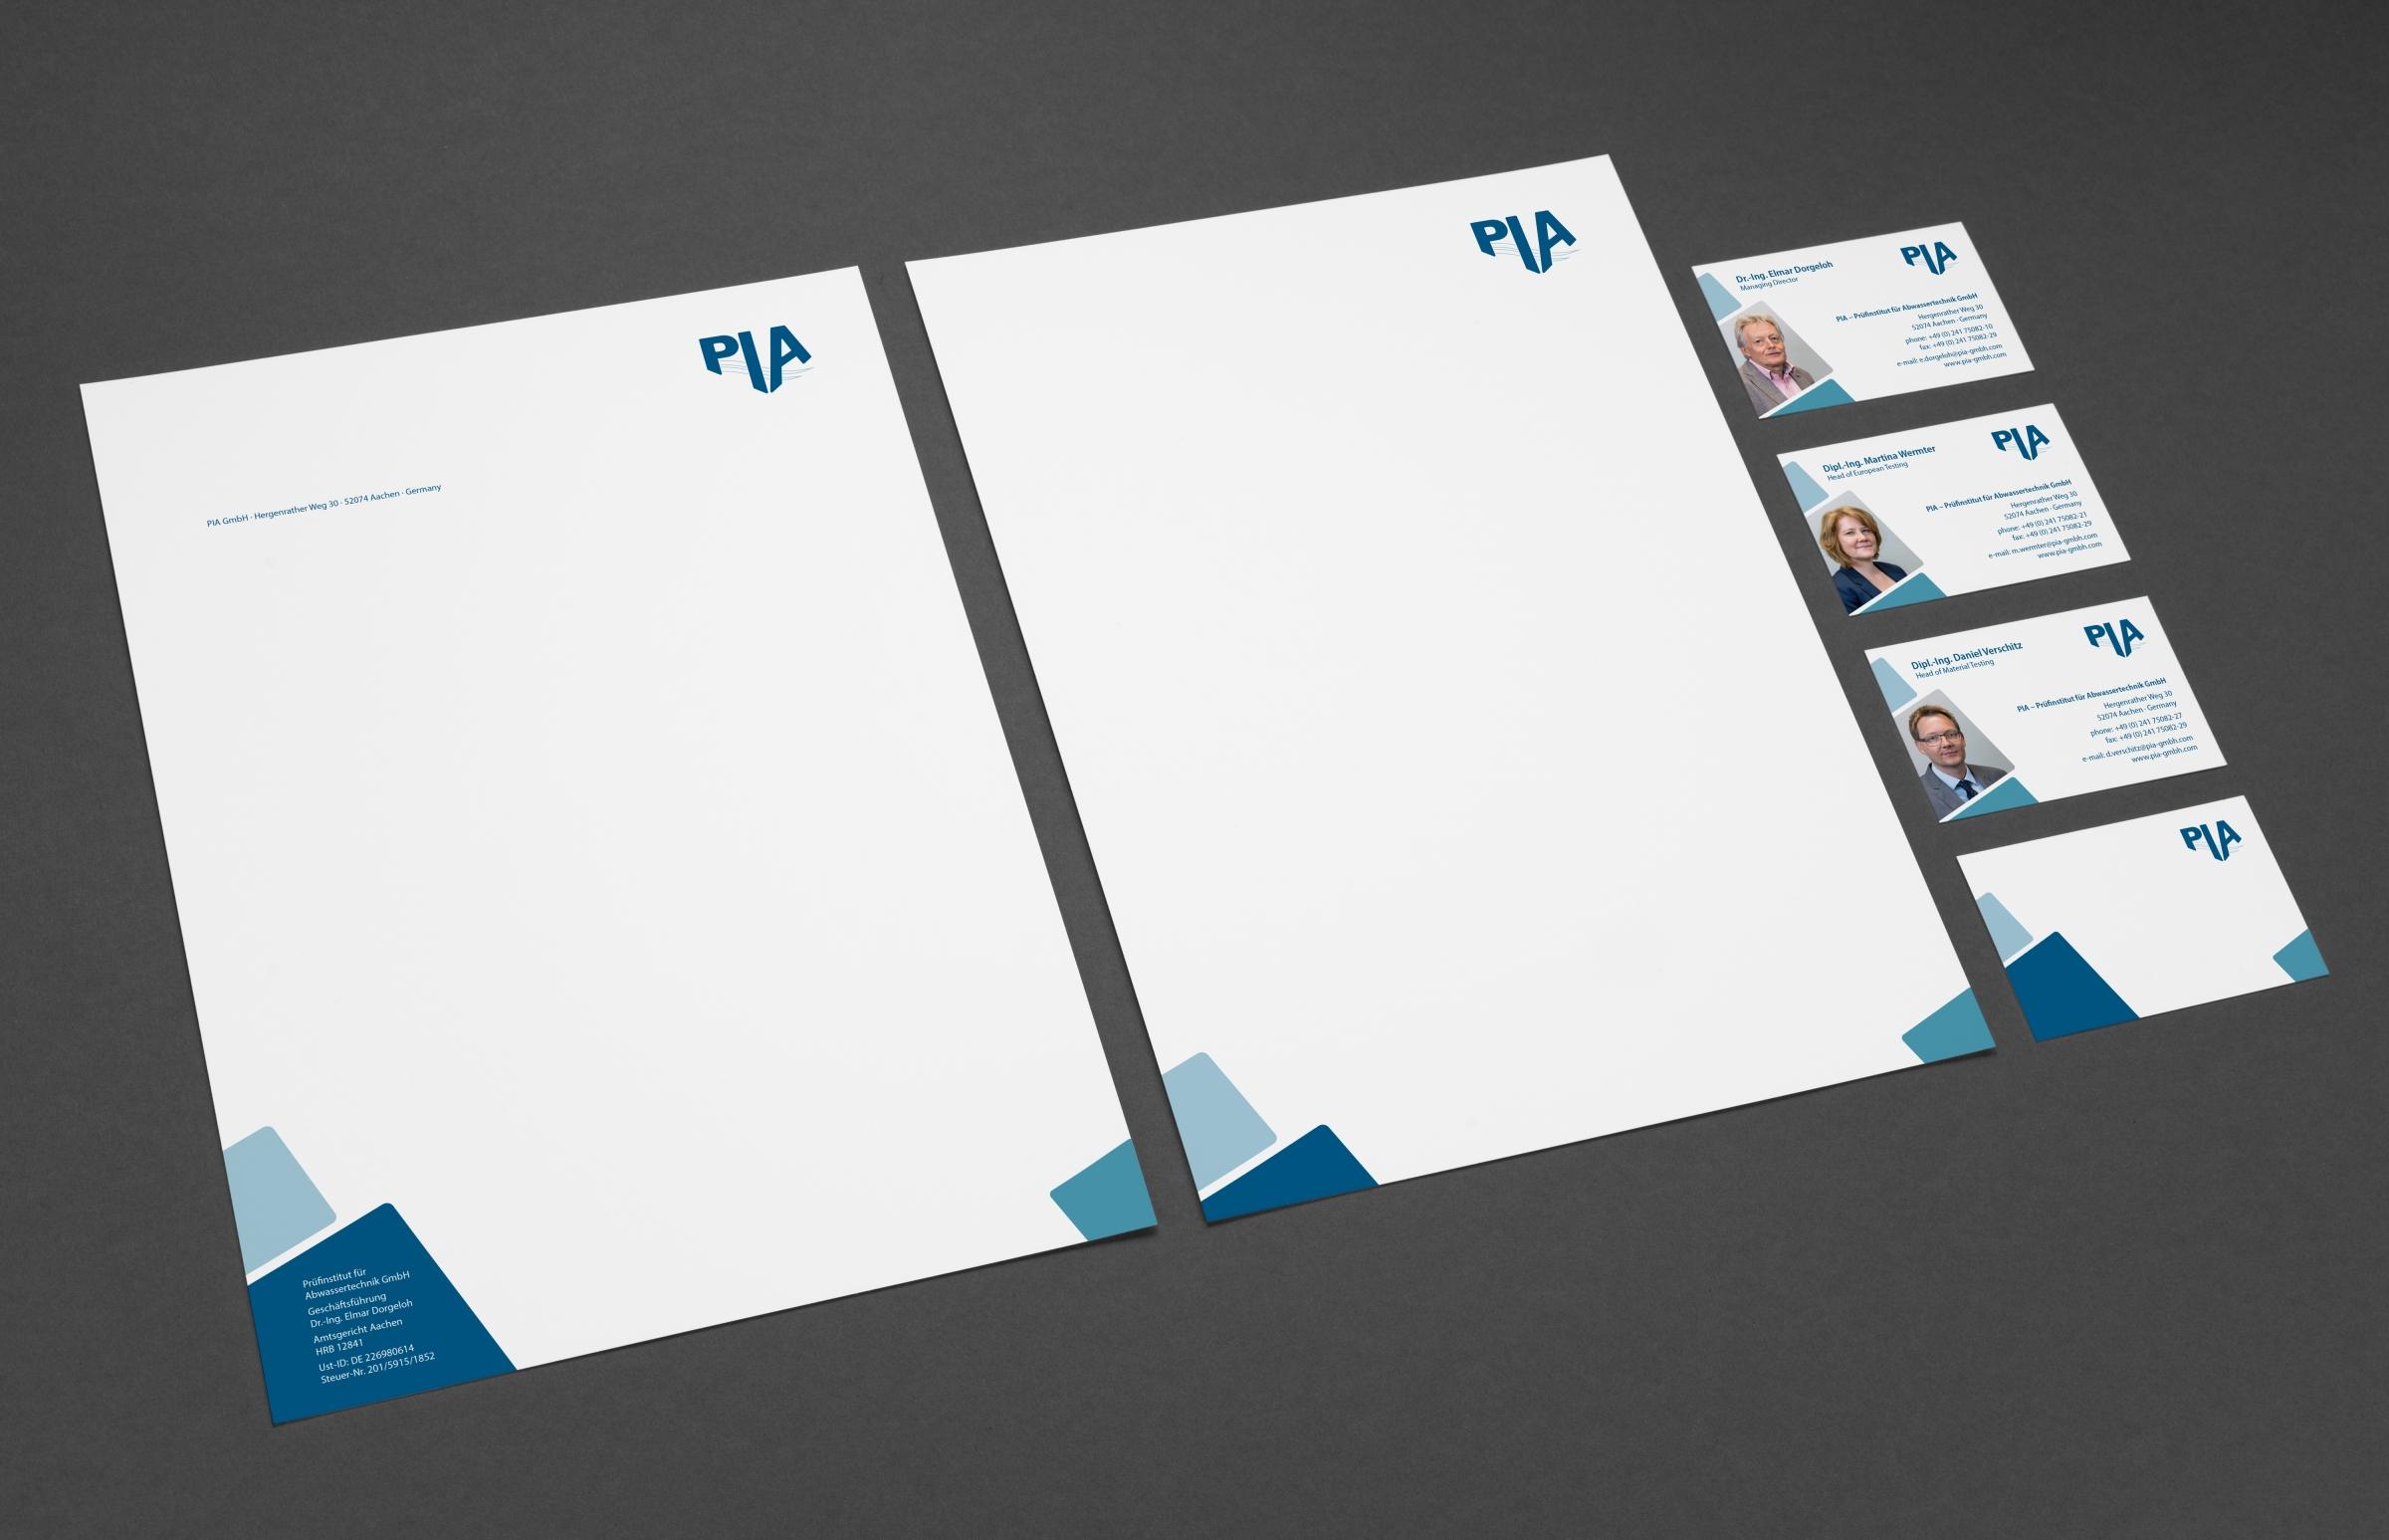 PIA Aachen Corporate Design